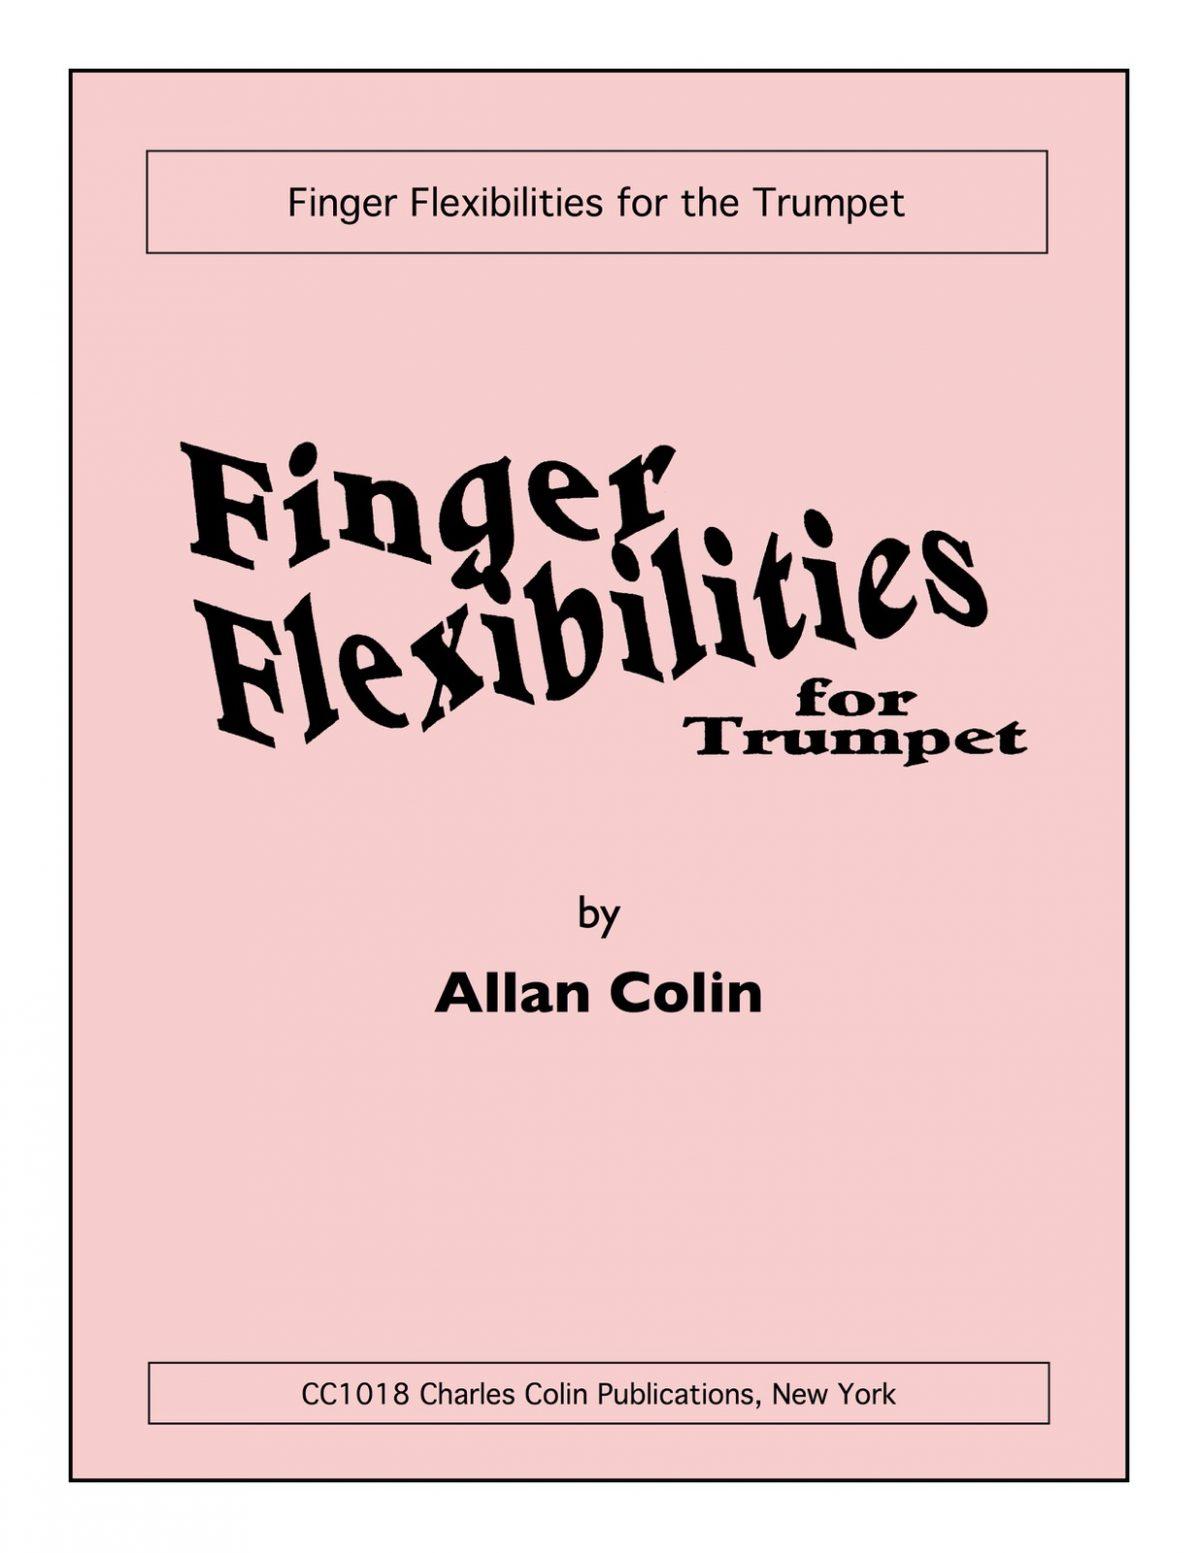 Colin, Finger Flexibilities for Trumpet-p01